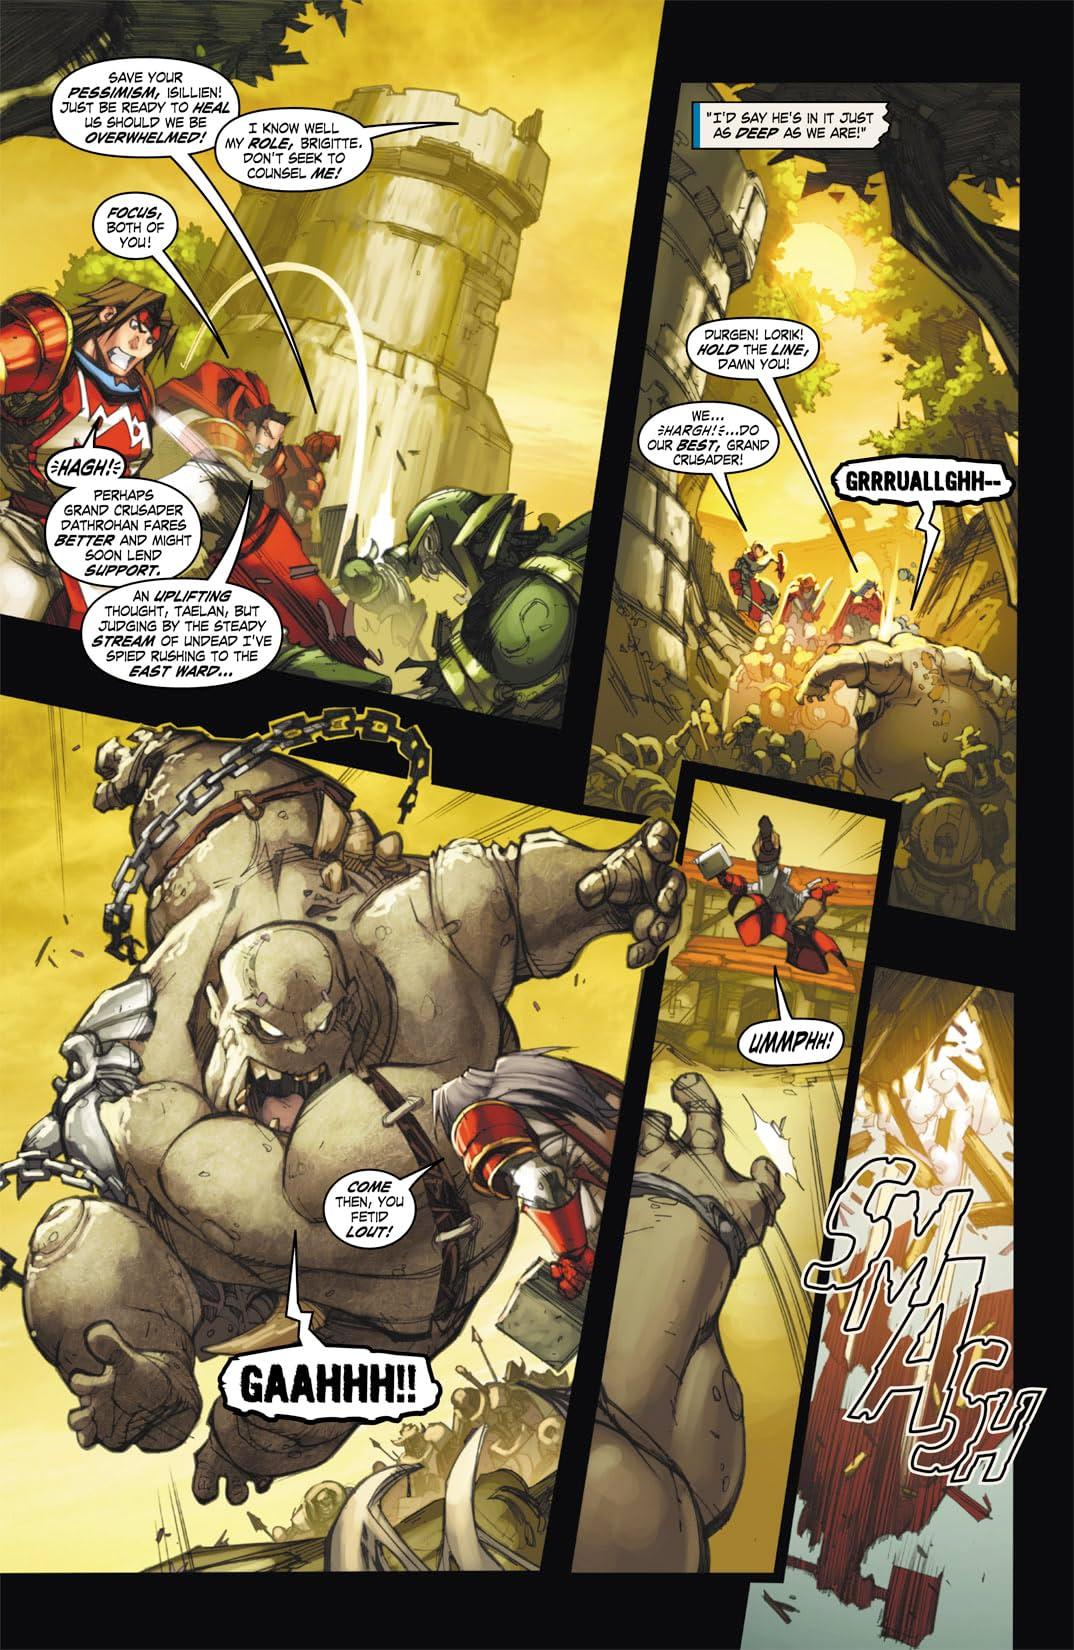 World of Warcraft: Ashbringer #4 (of 4)